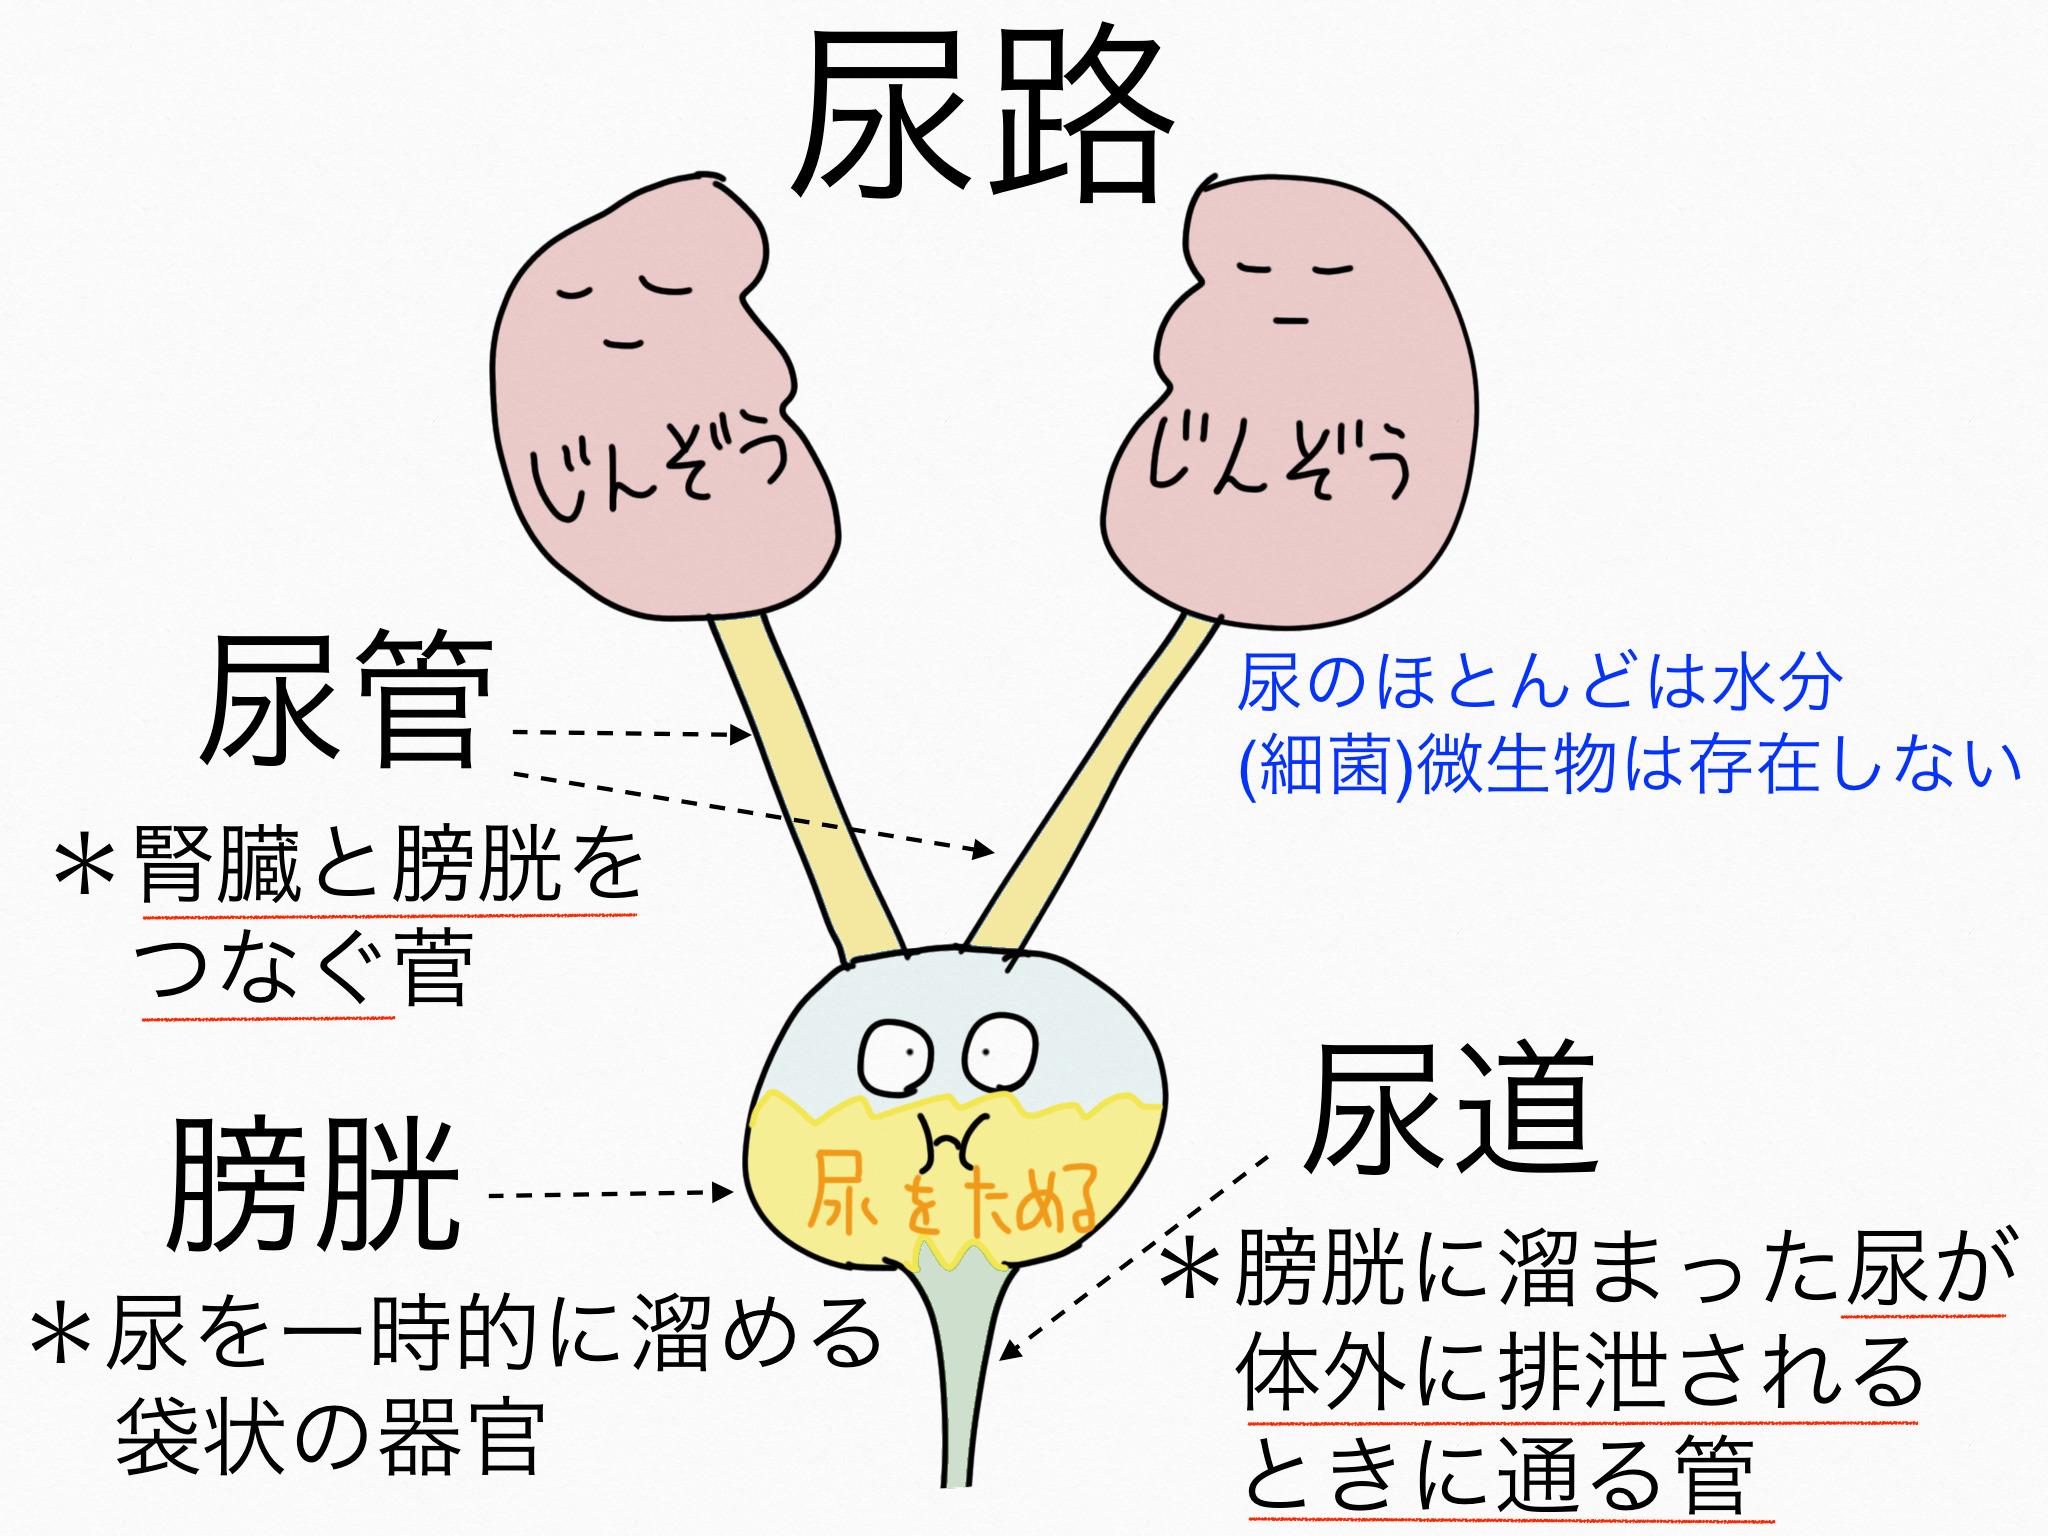 泌尿器系/尿路(尿管、膀胱、尿道)【第2章の覚え方】